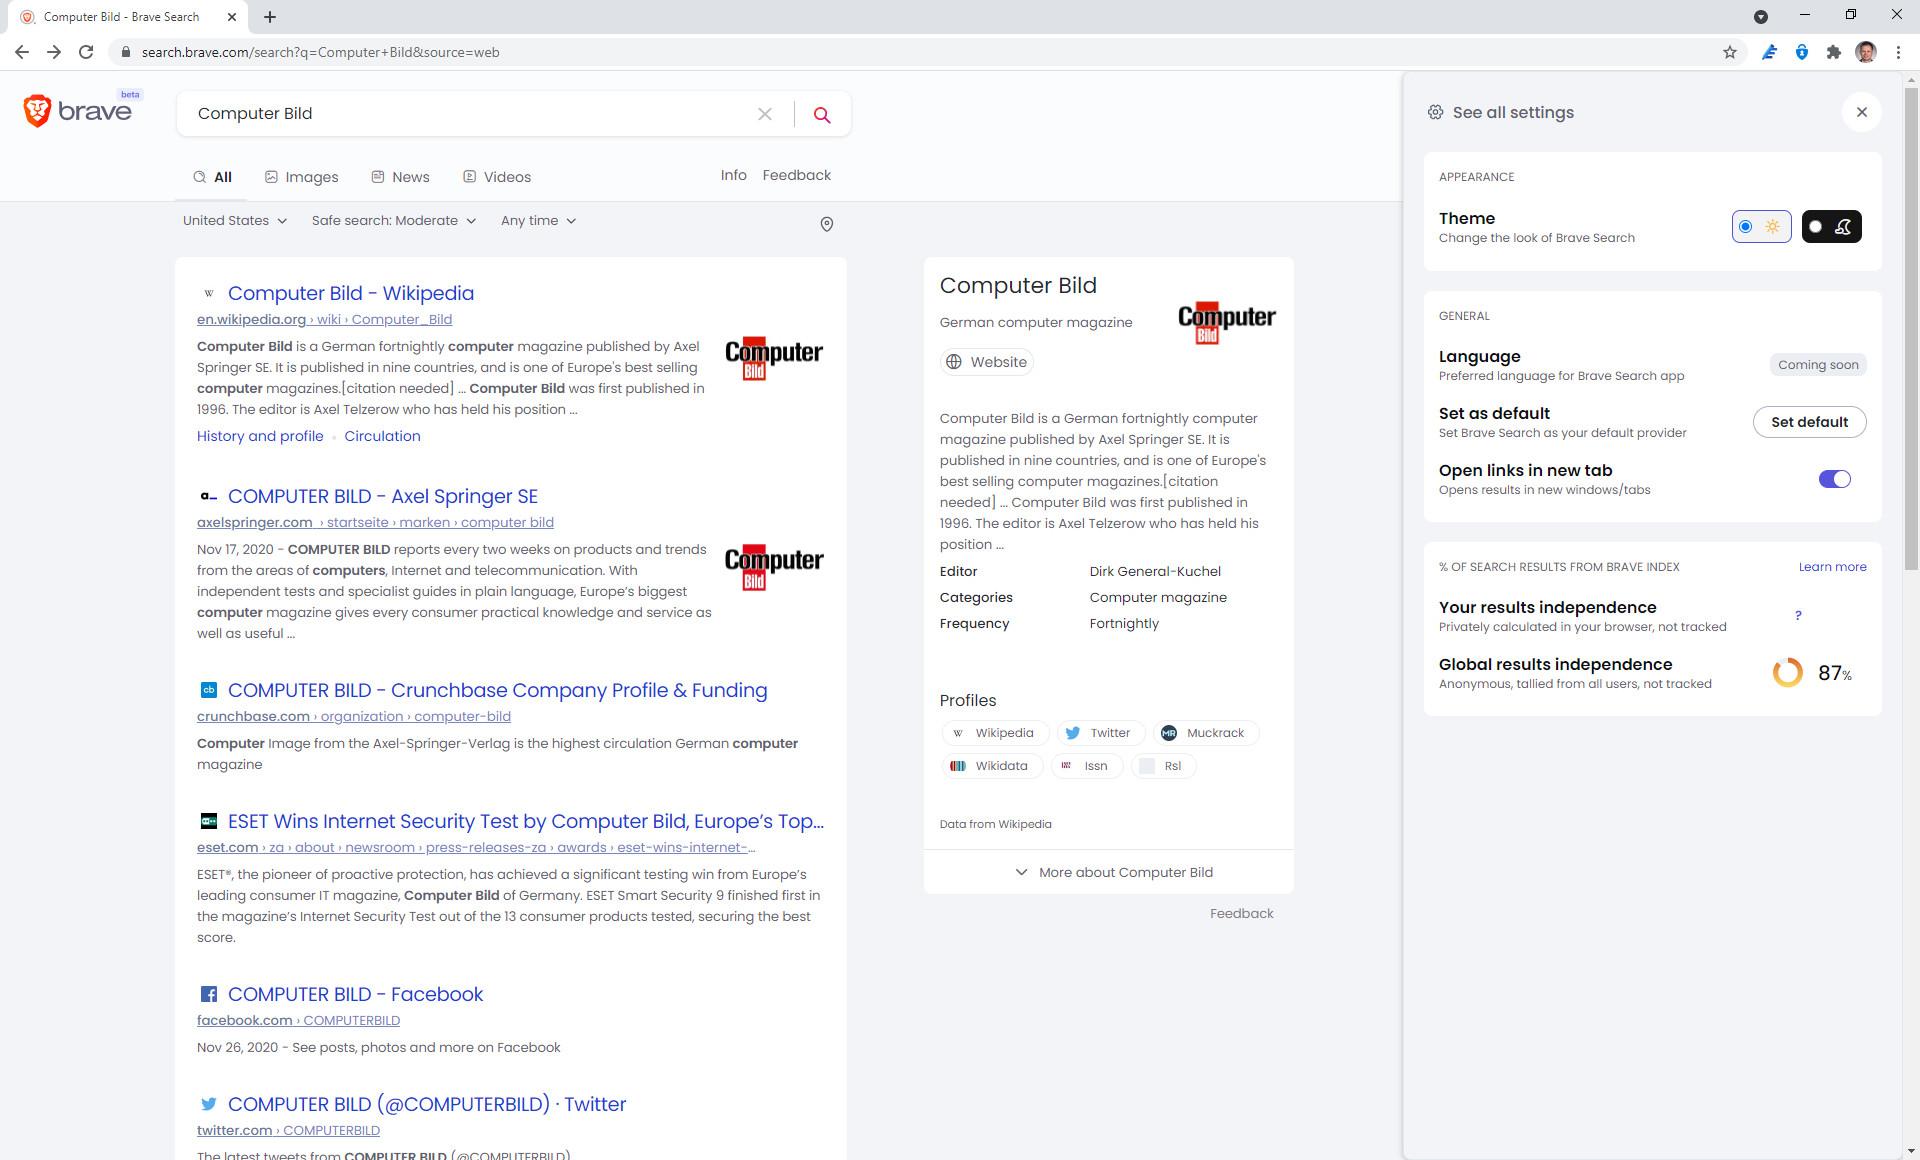 Screenshot 1 - Brave Search